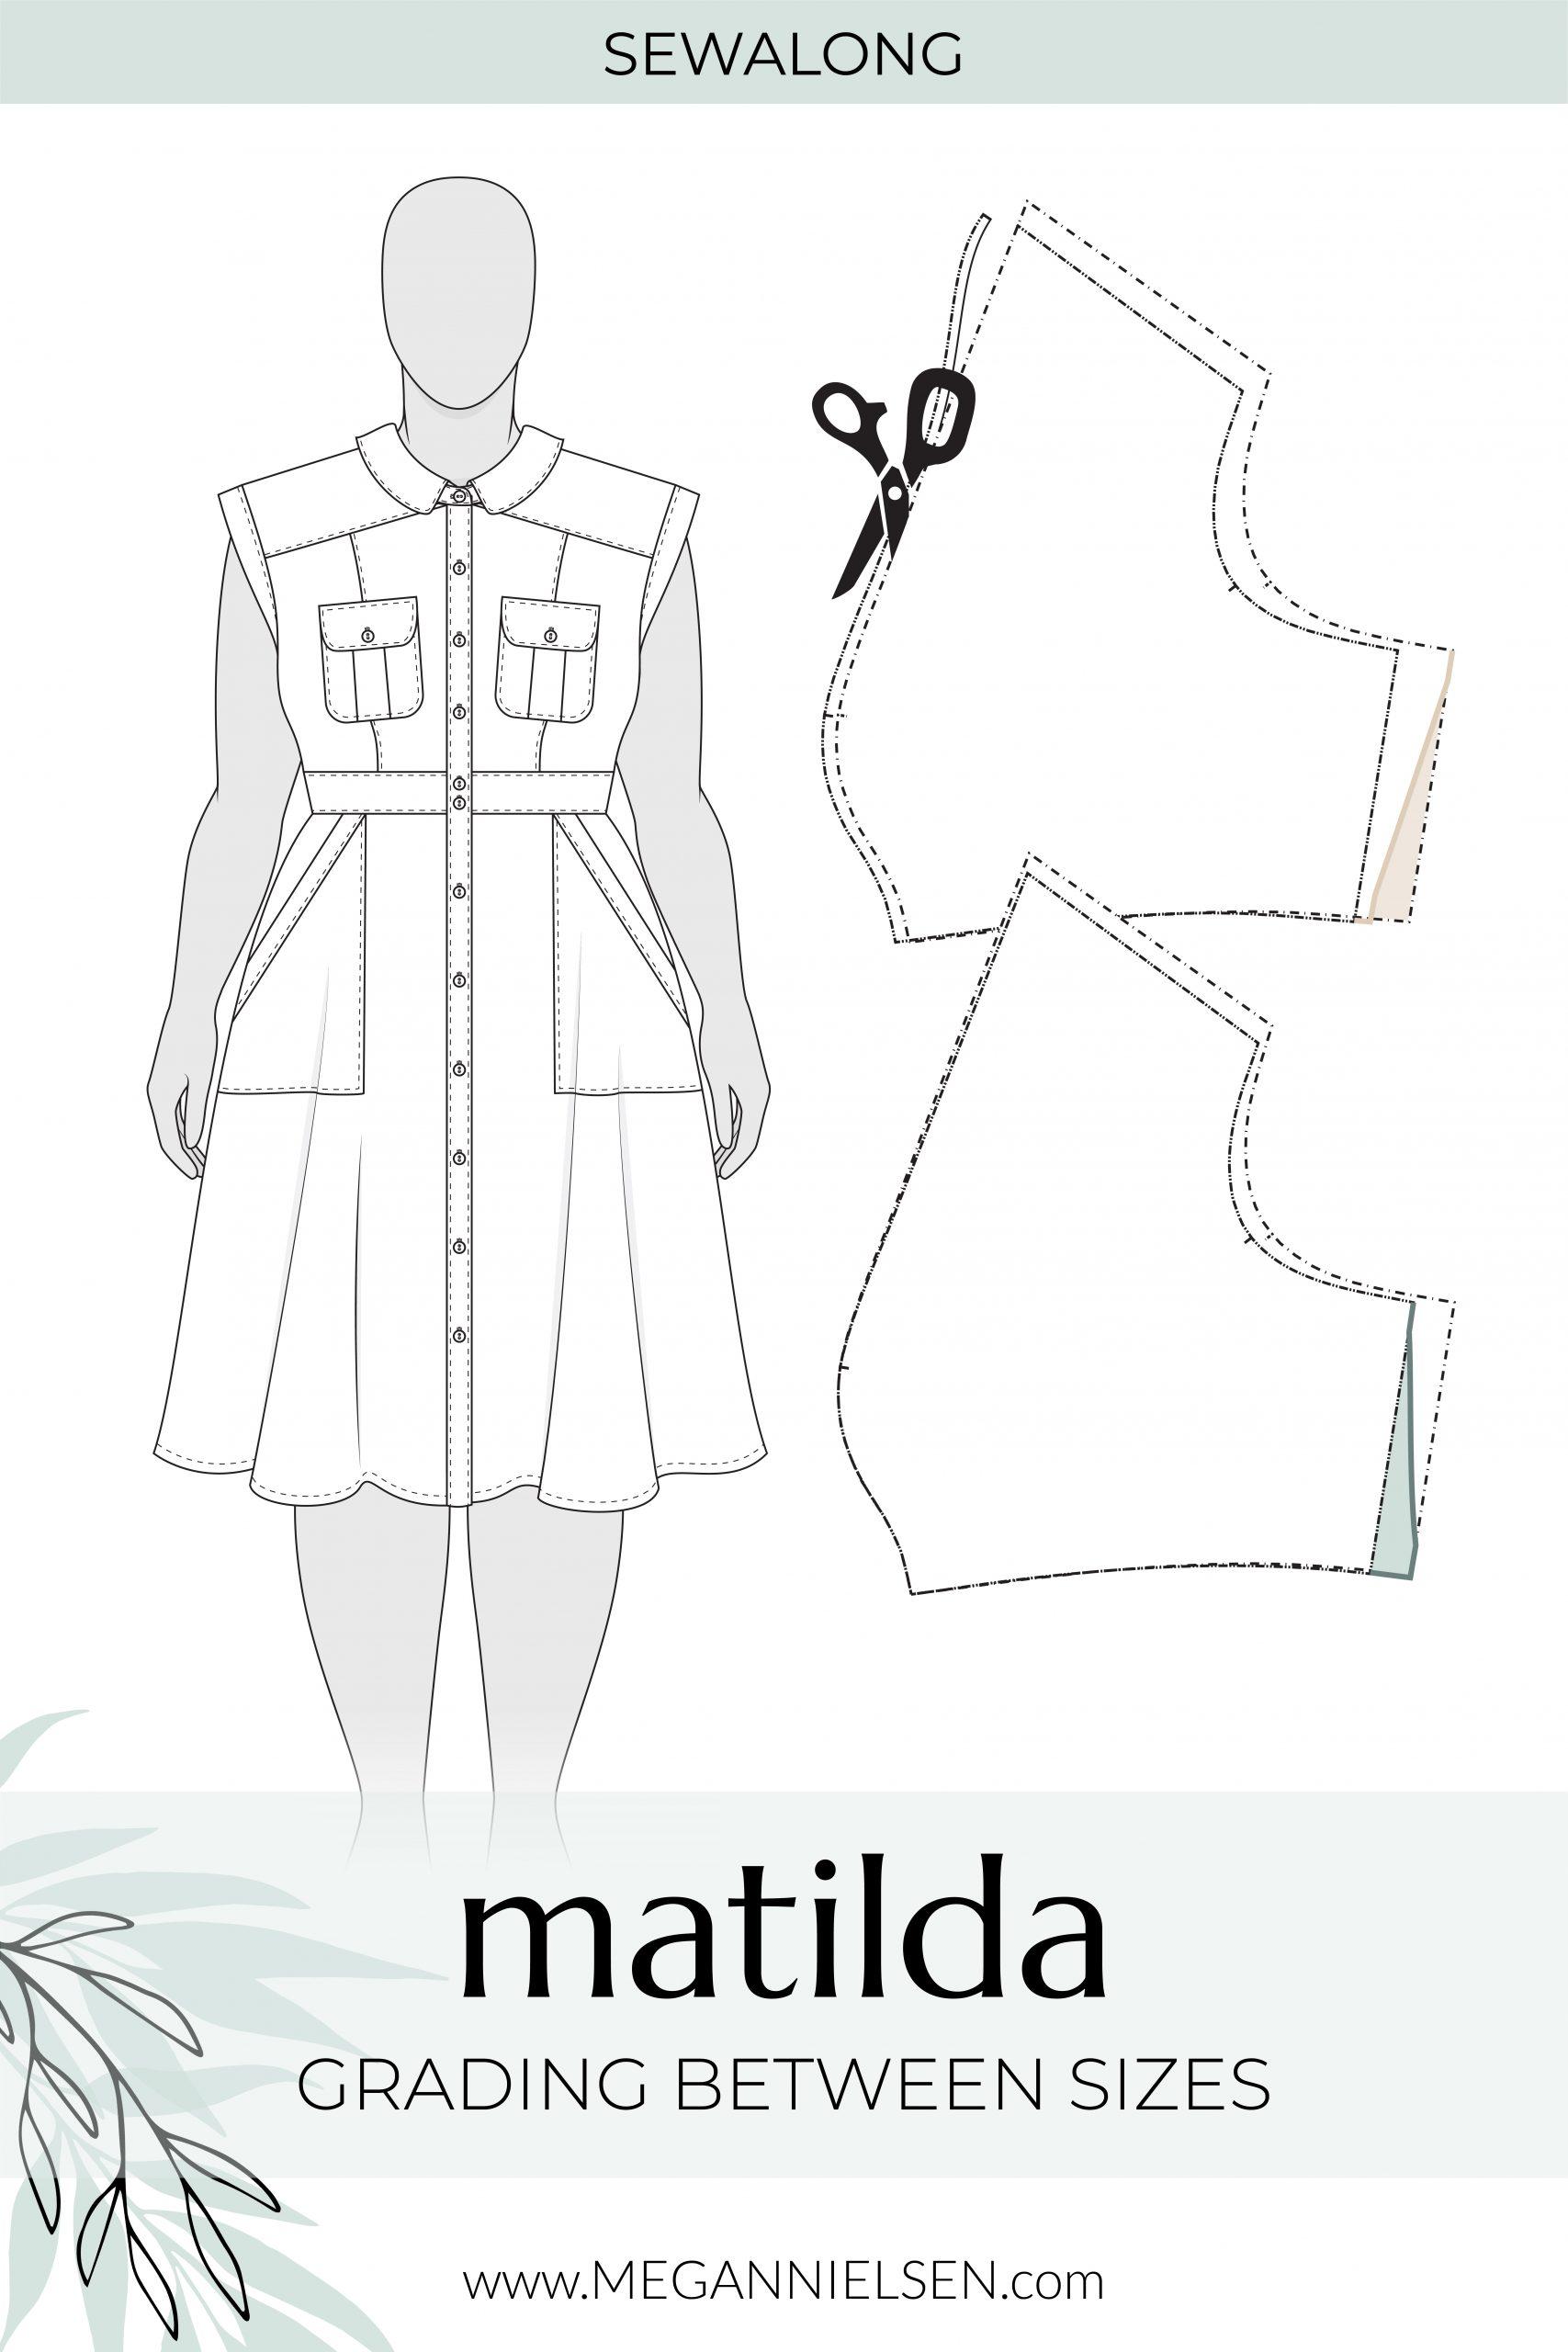 Megan Nielsen Patterns | Matilda Sewalong: Grading Between Sizes